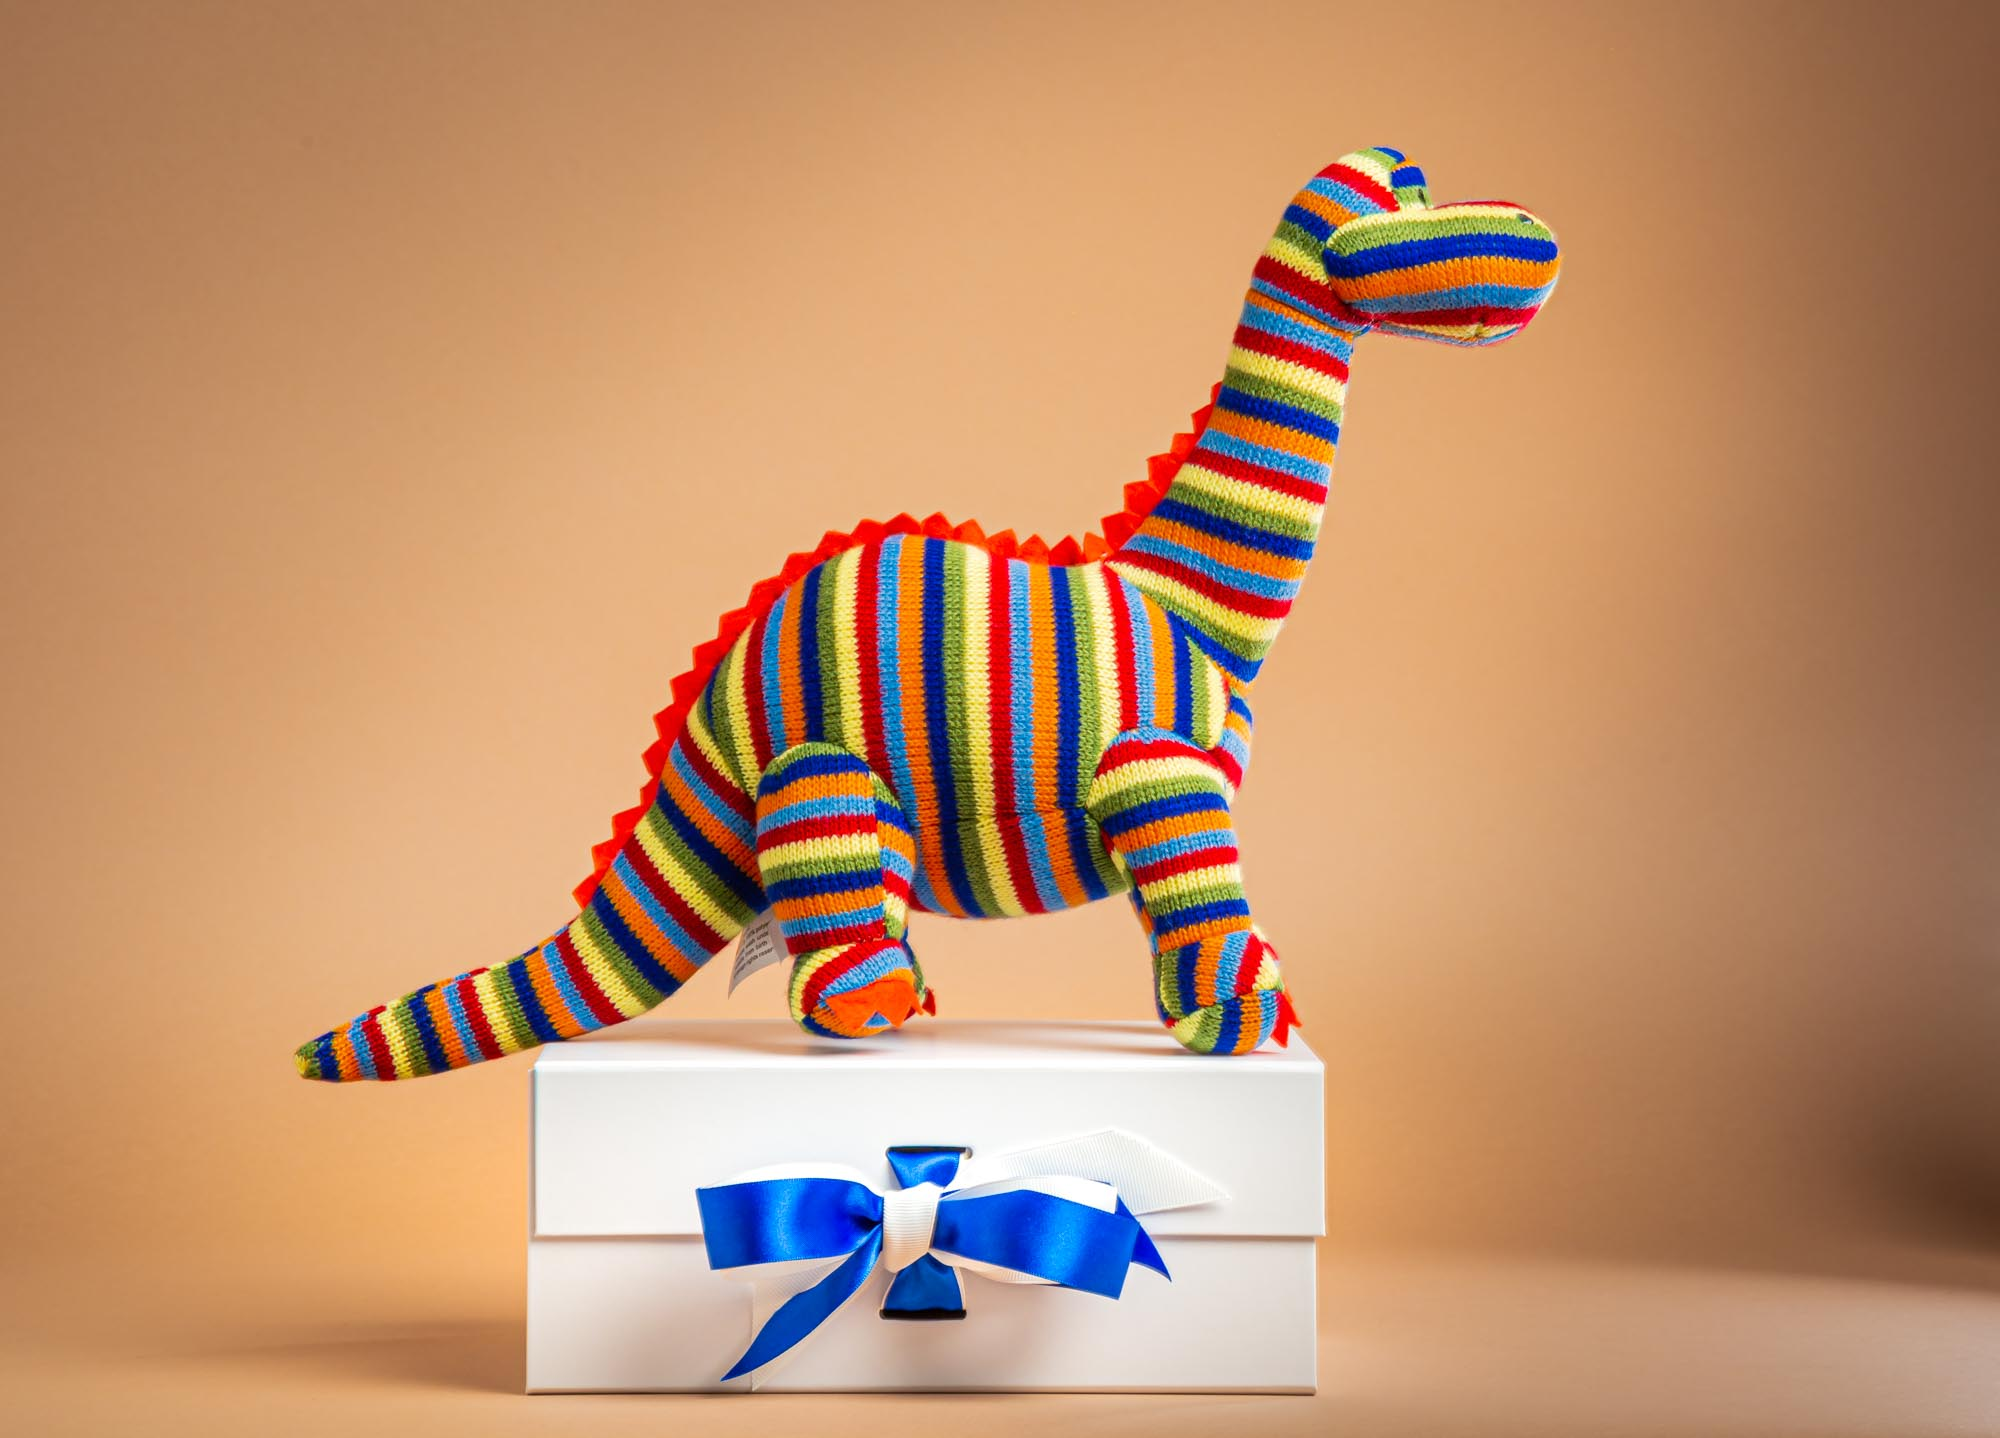 Send a Cuddly Beautiful Gifts